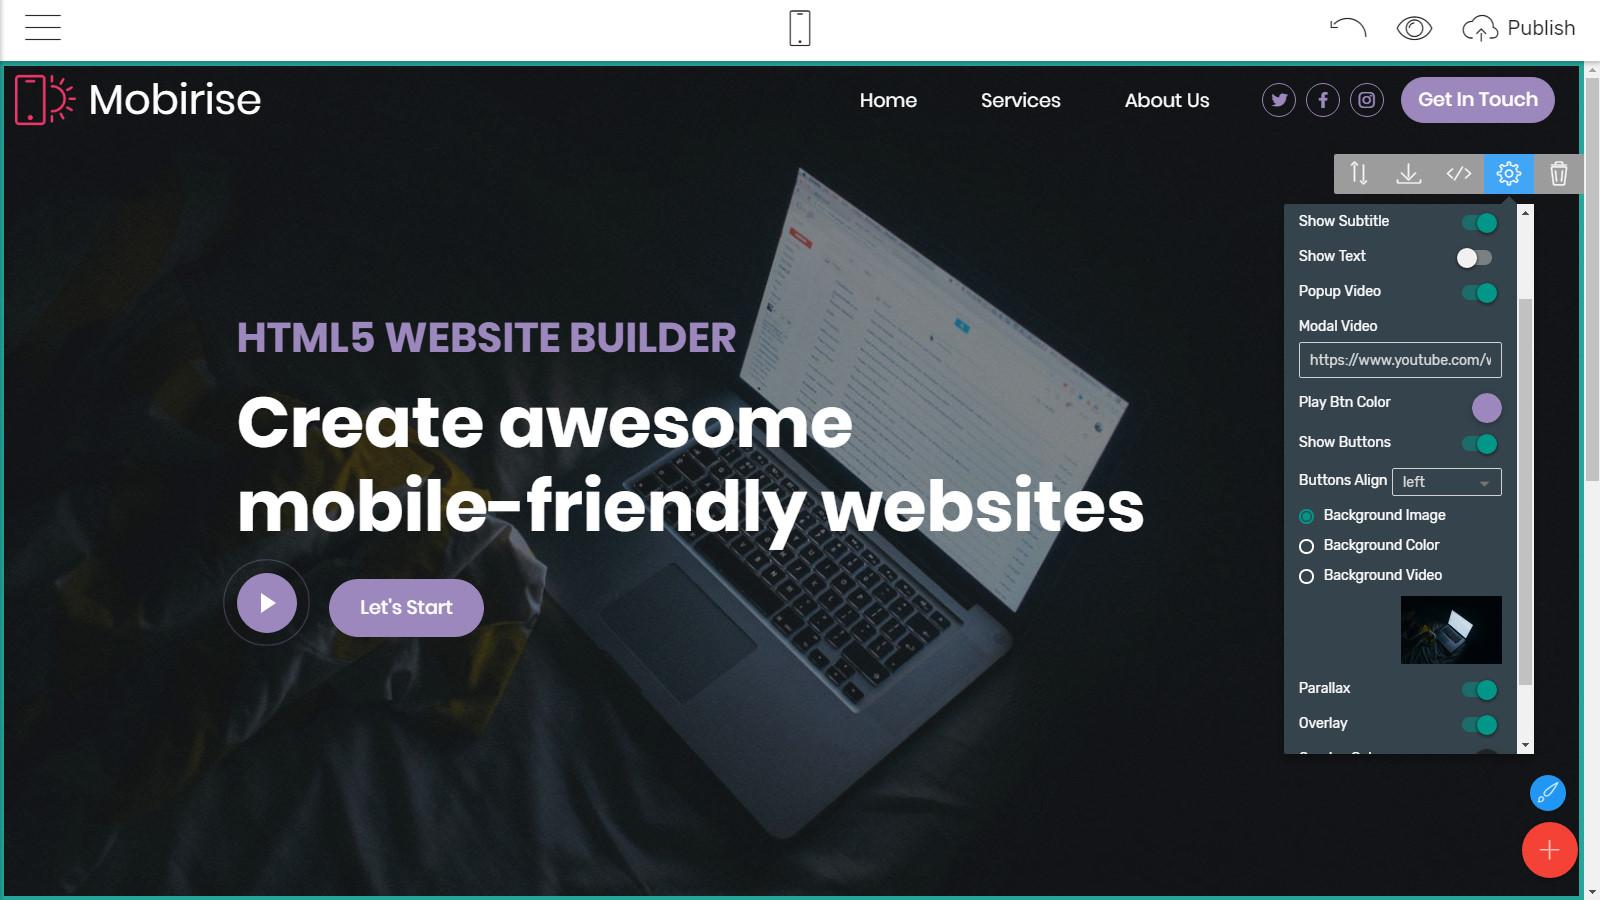 mobile-friendly webpage layouts